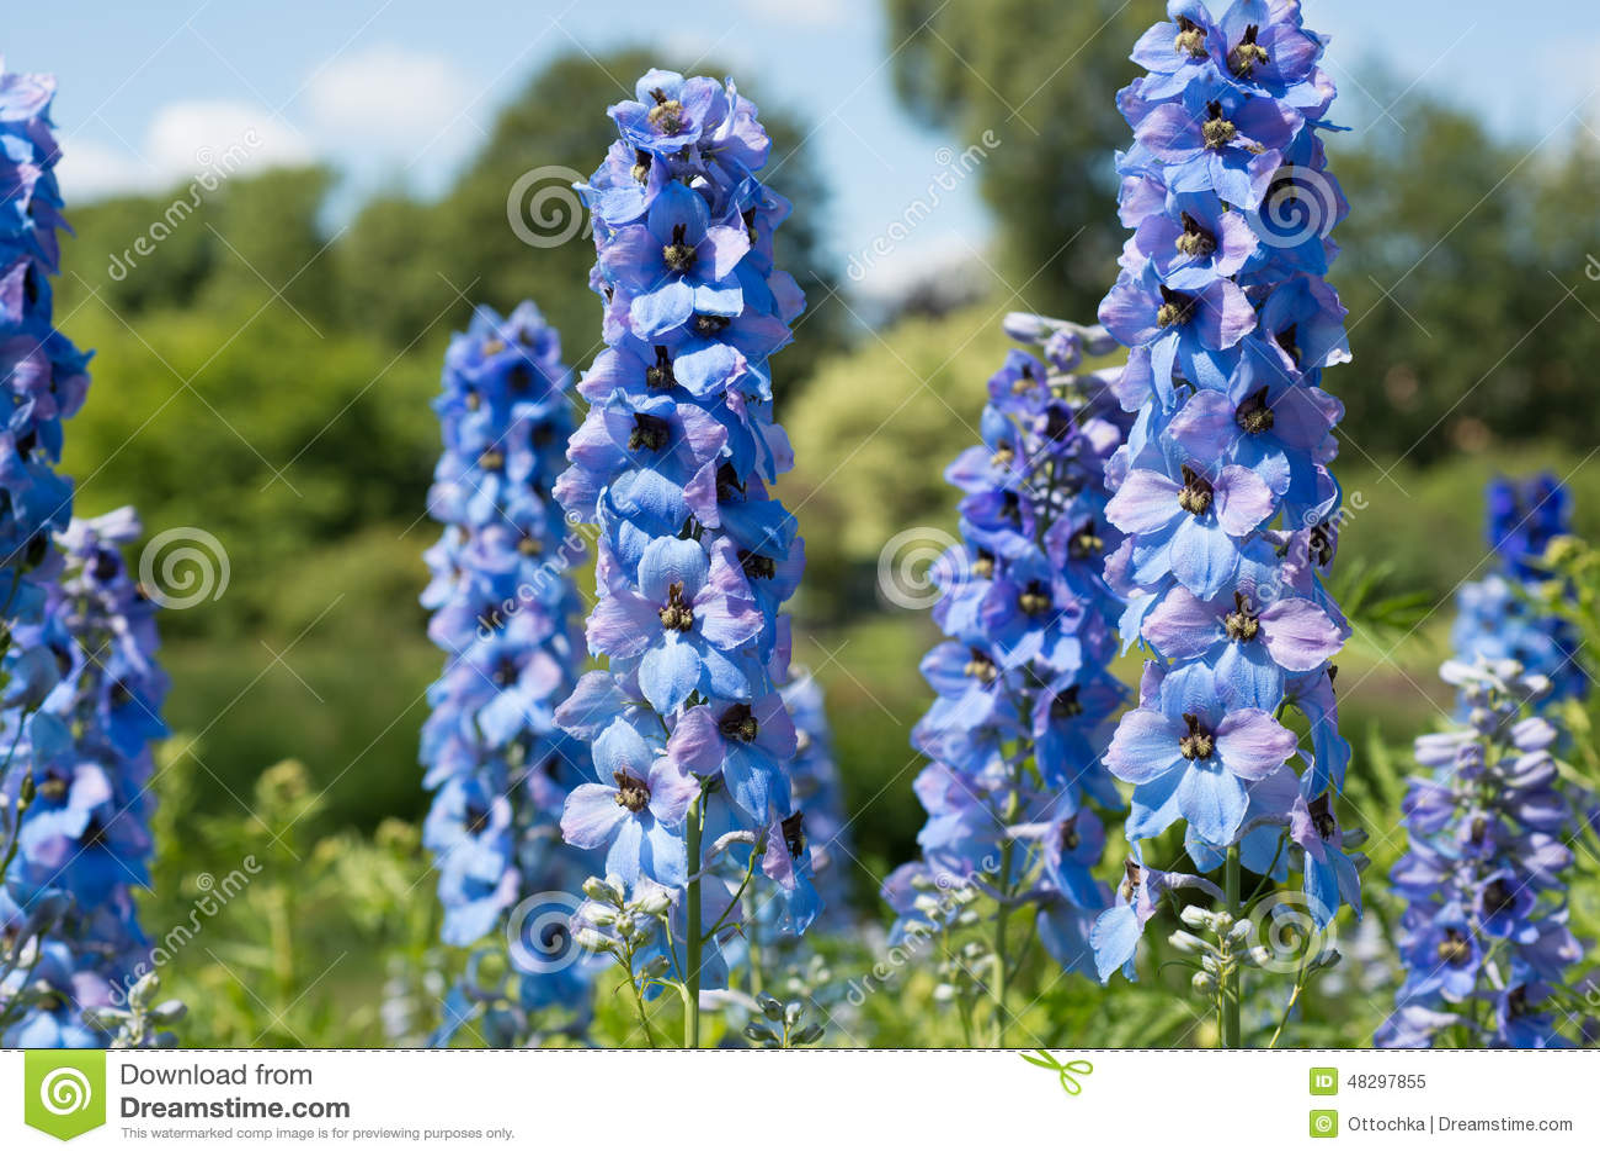 Flower Delphinium Stock Image Image Of Gardening Grow 48297855